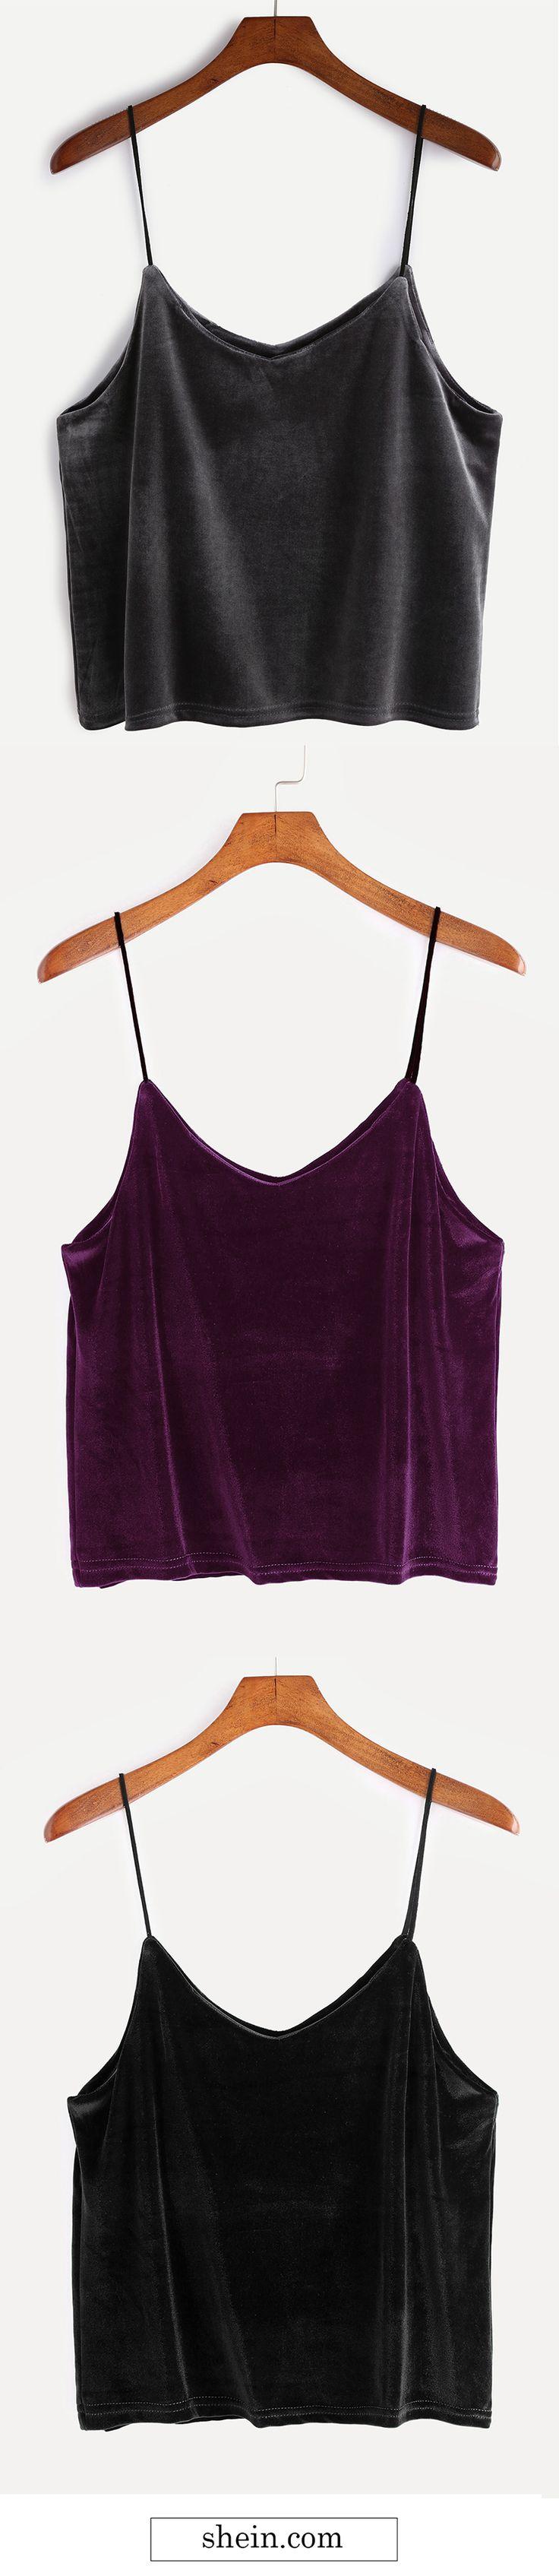 Trendy Velvet Cami Top.